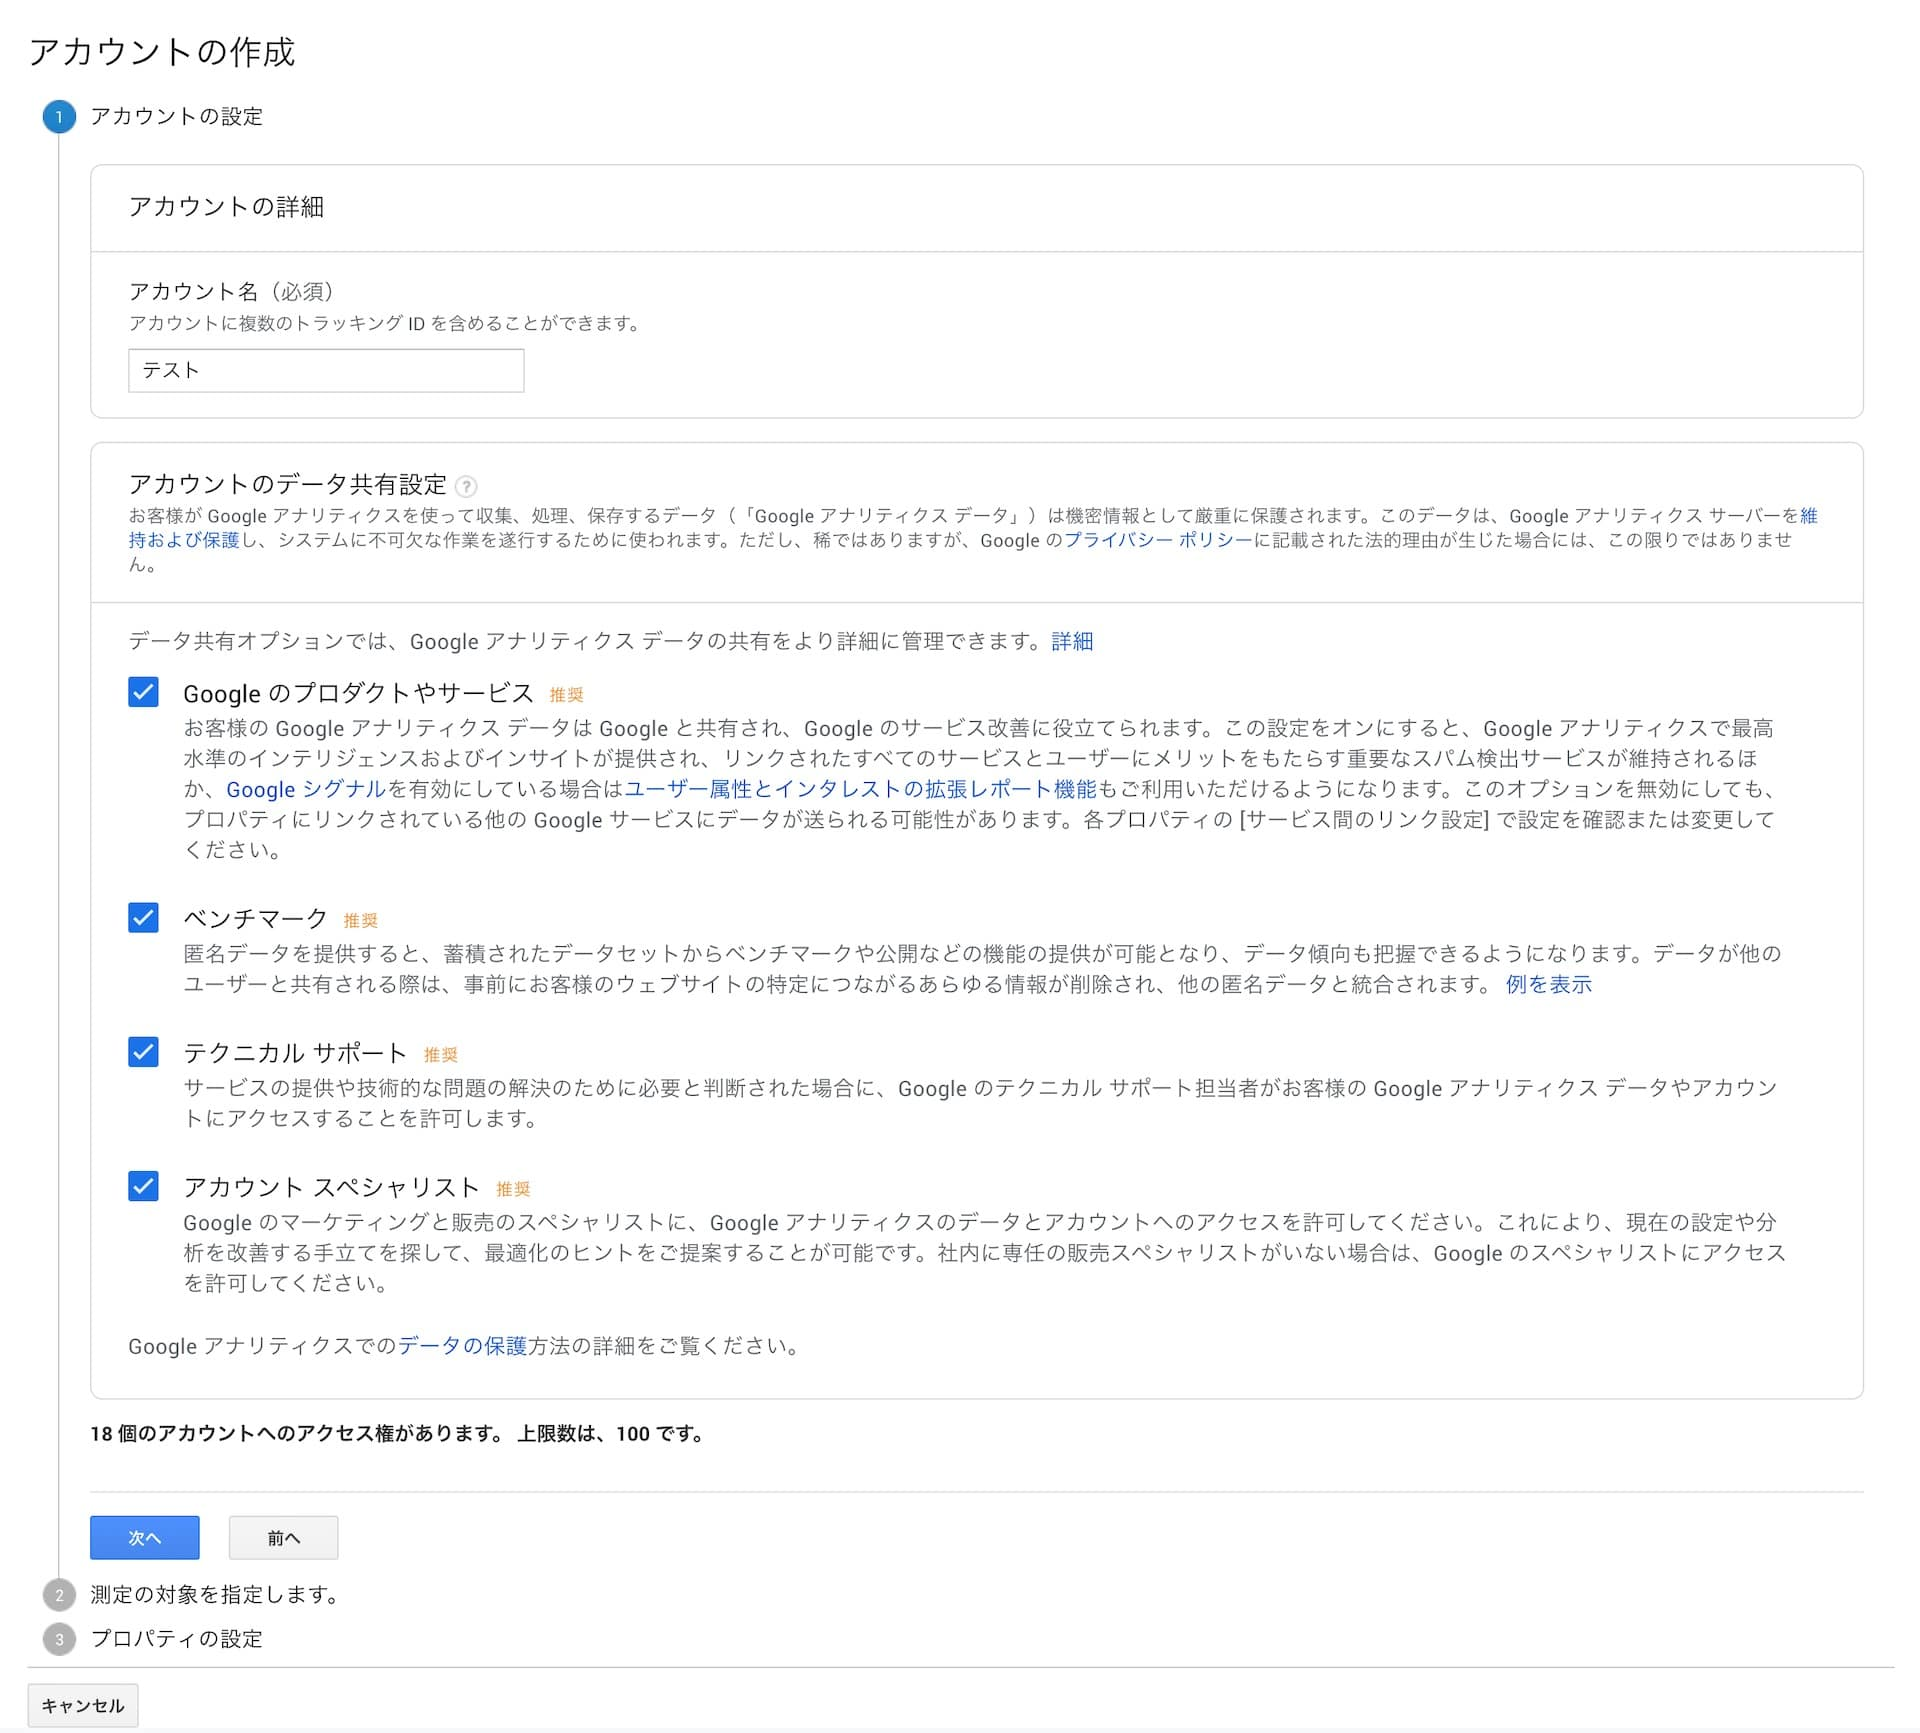 Googleアナリティクスでアカウントの詳細を設定する